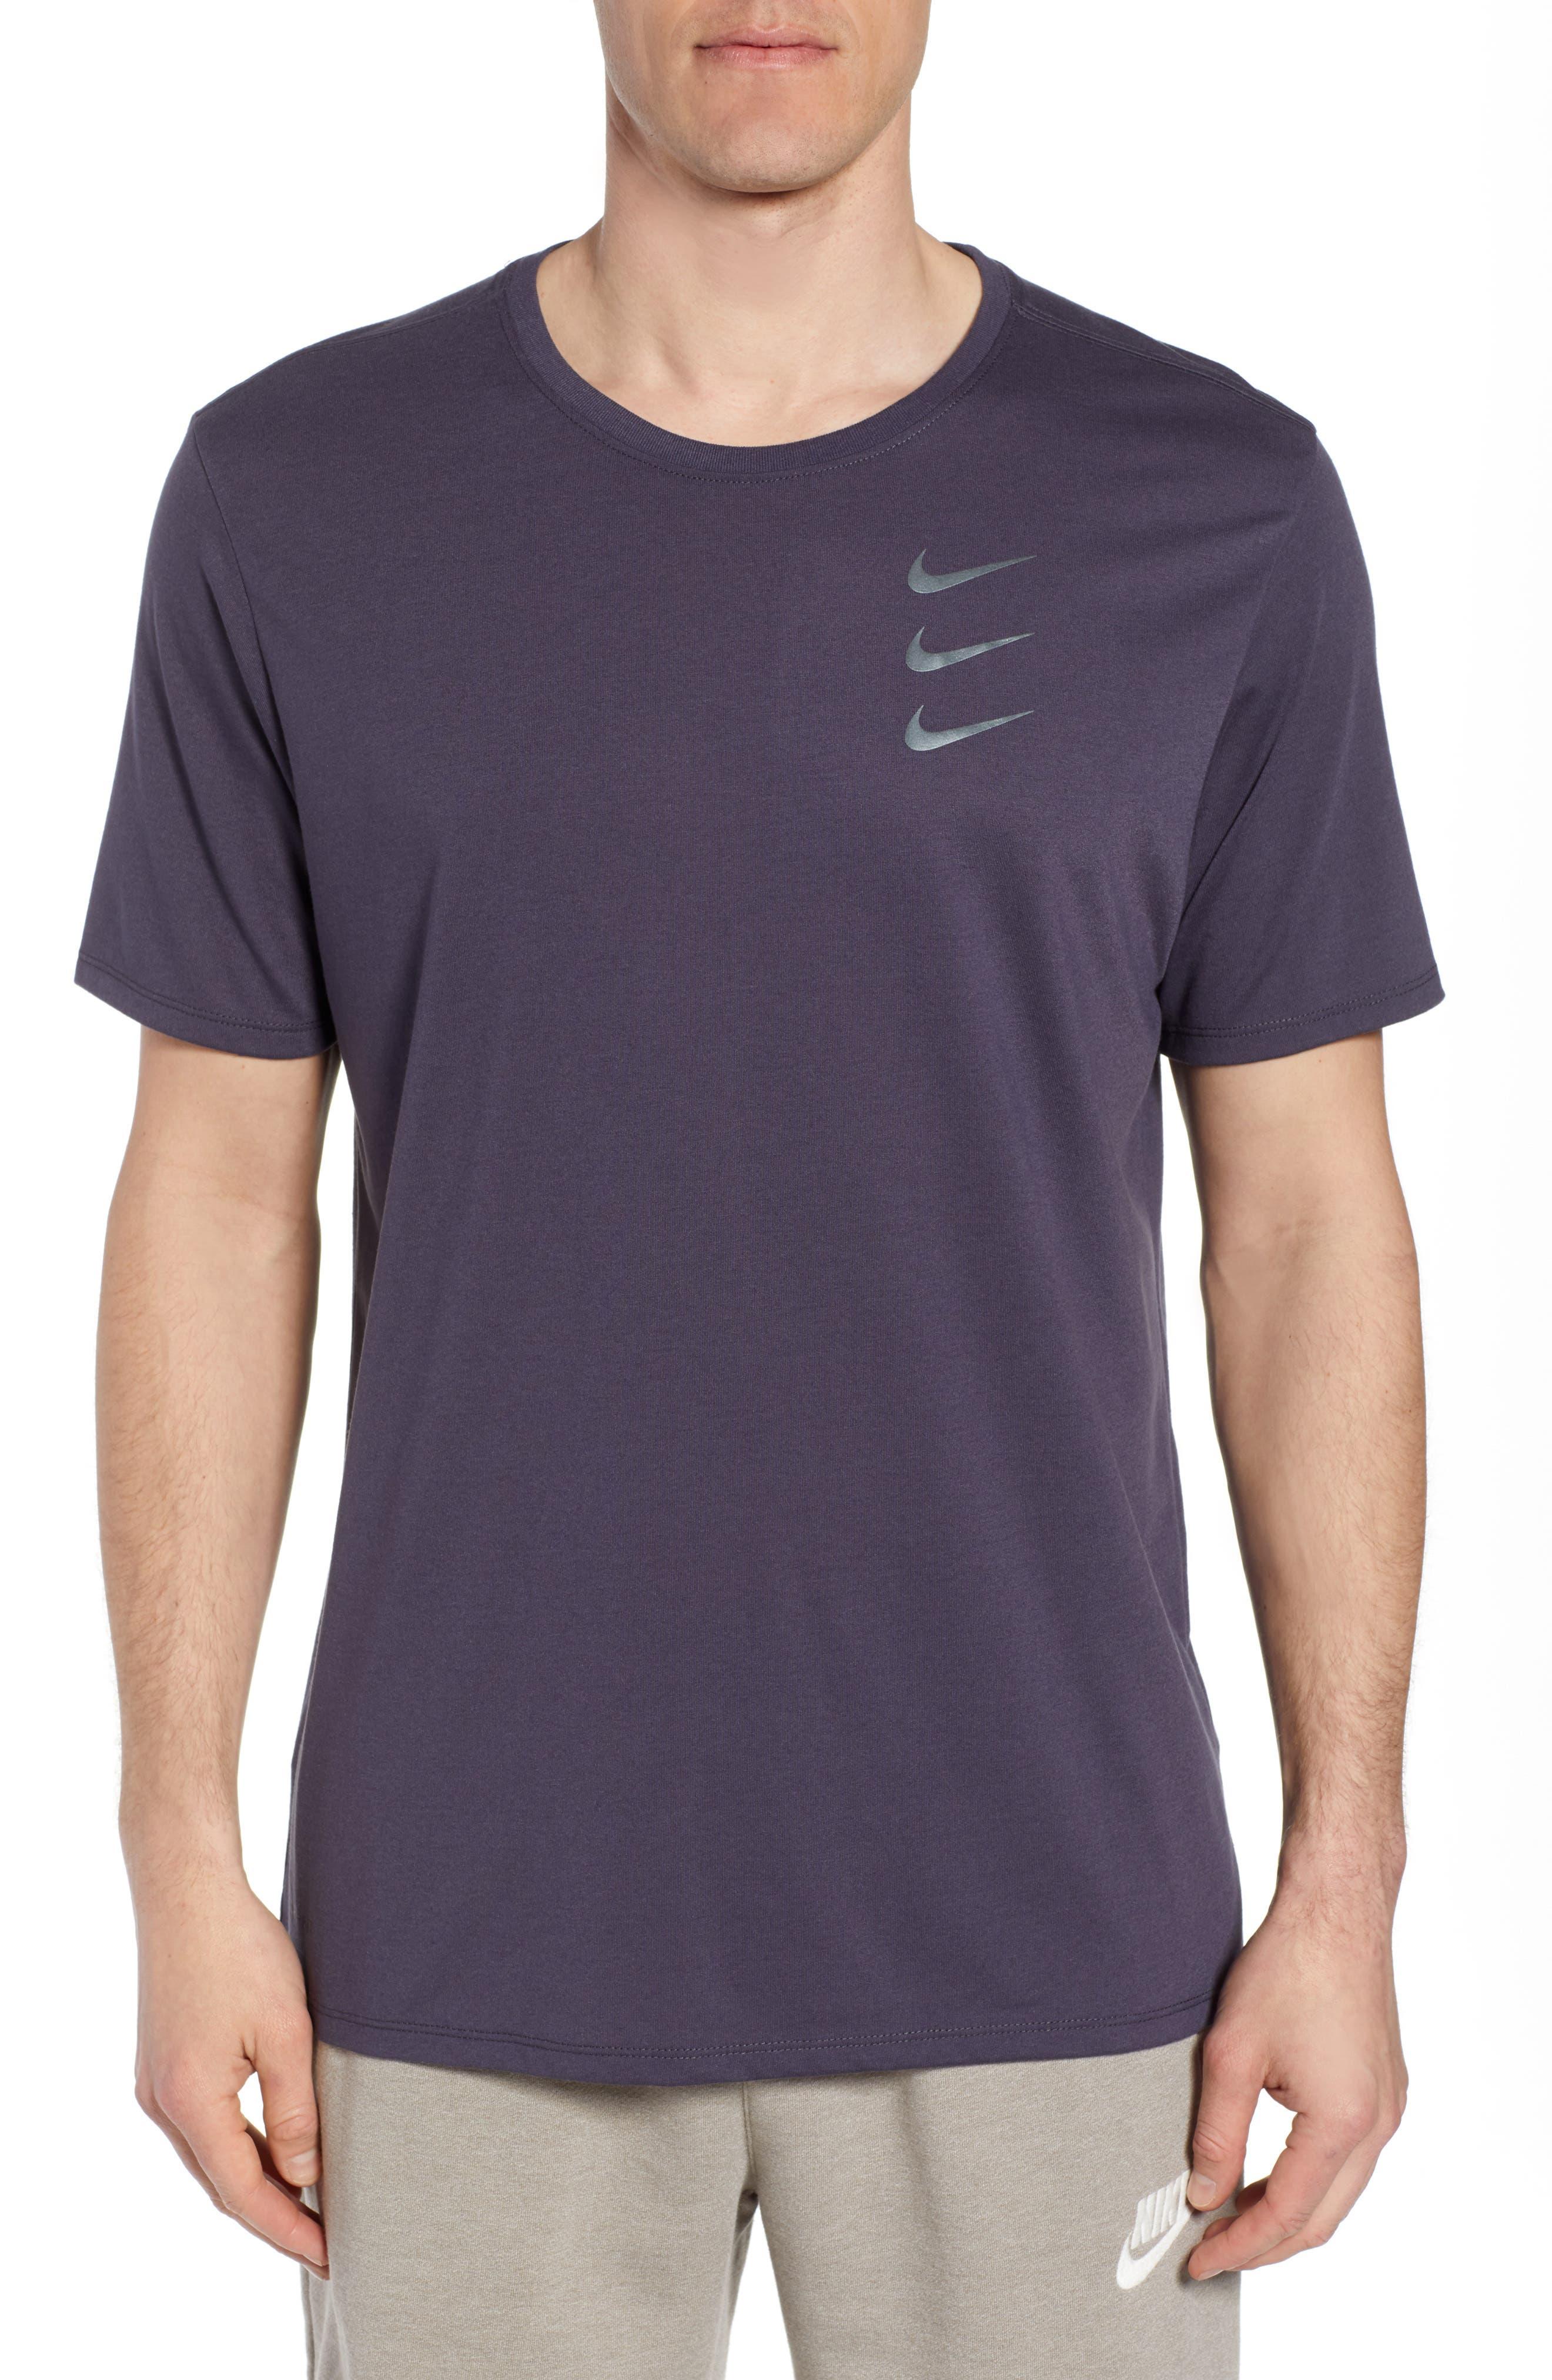 Dry Running Division T-Shirt,                         Main,                         color, GRIDIRON/ GUNSMOKE